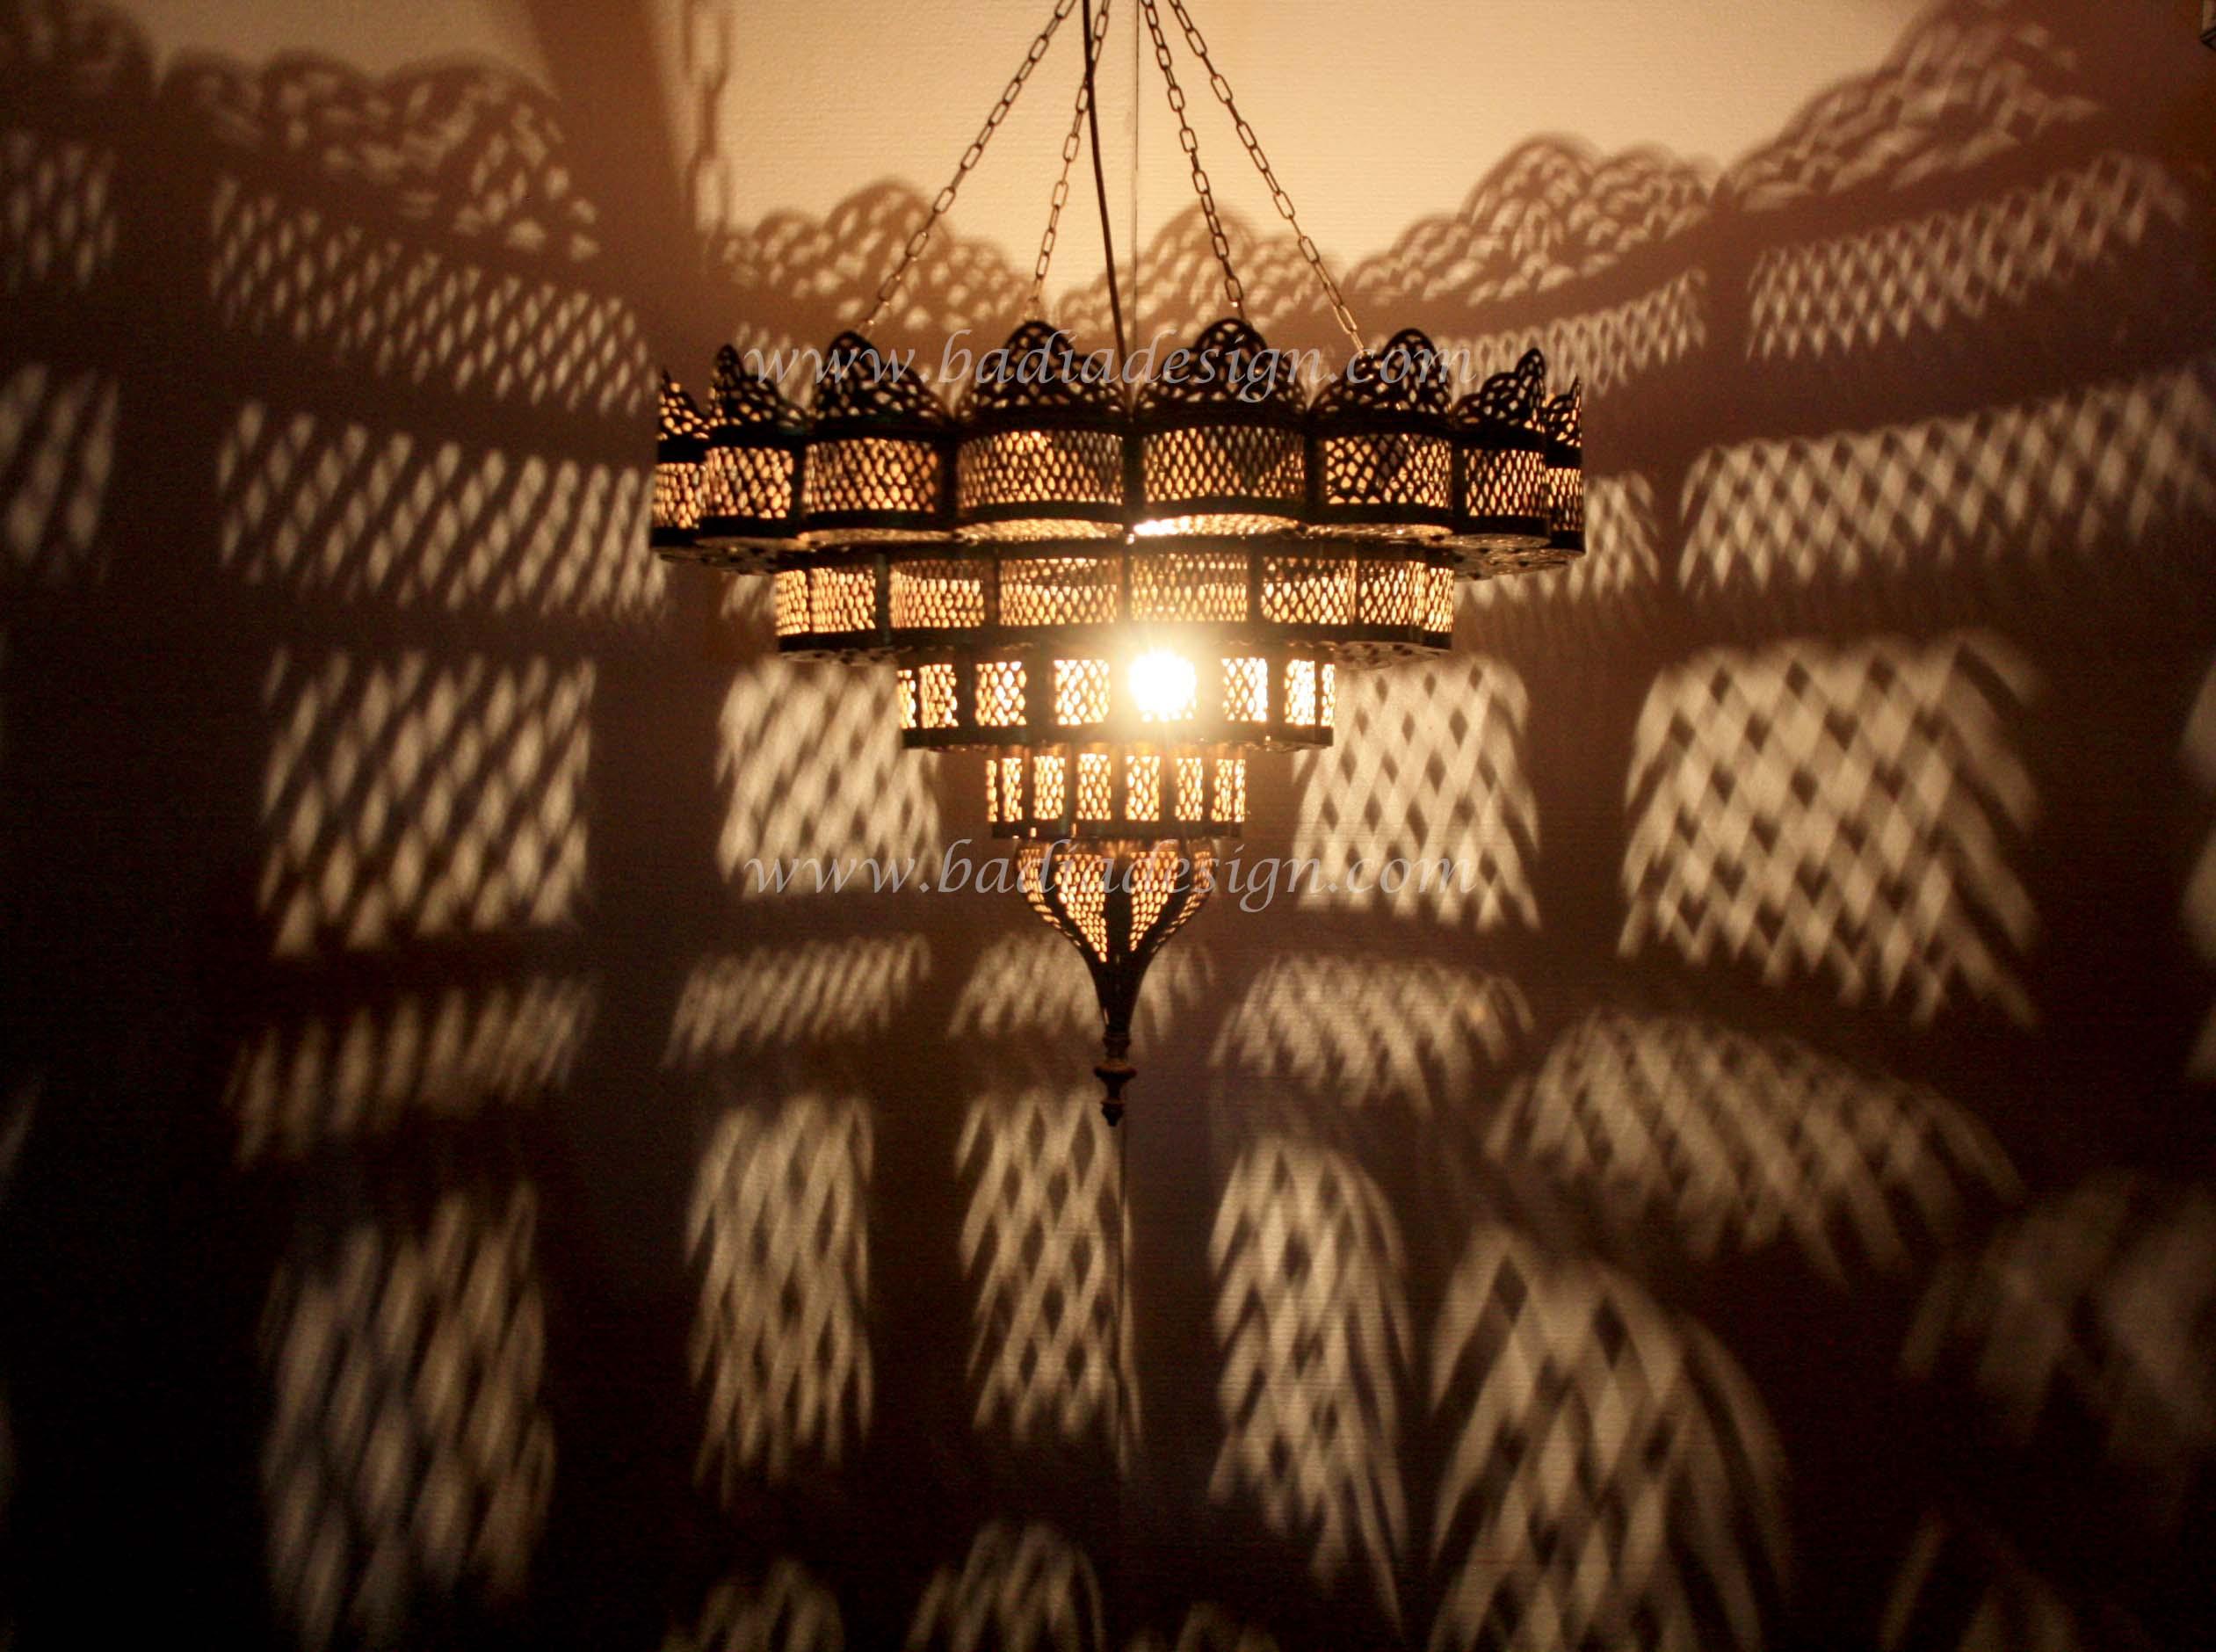 brass-upside-down-cake-chandelier-lig185-1.jpg